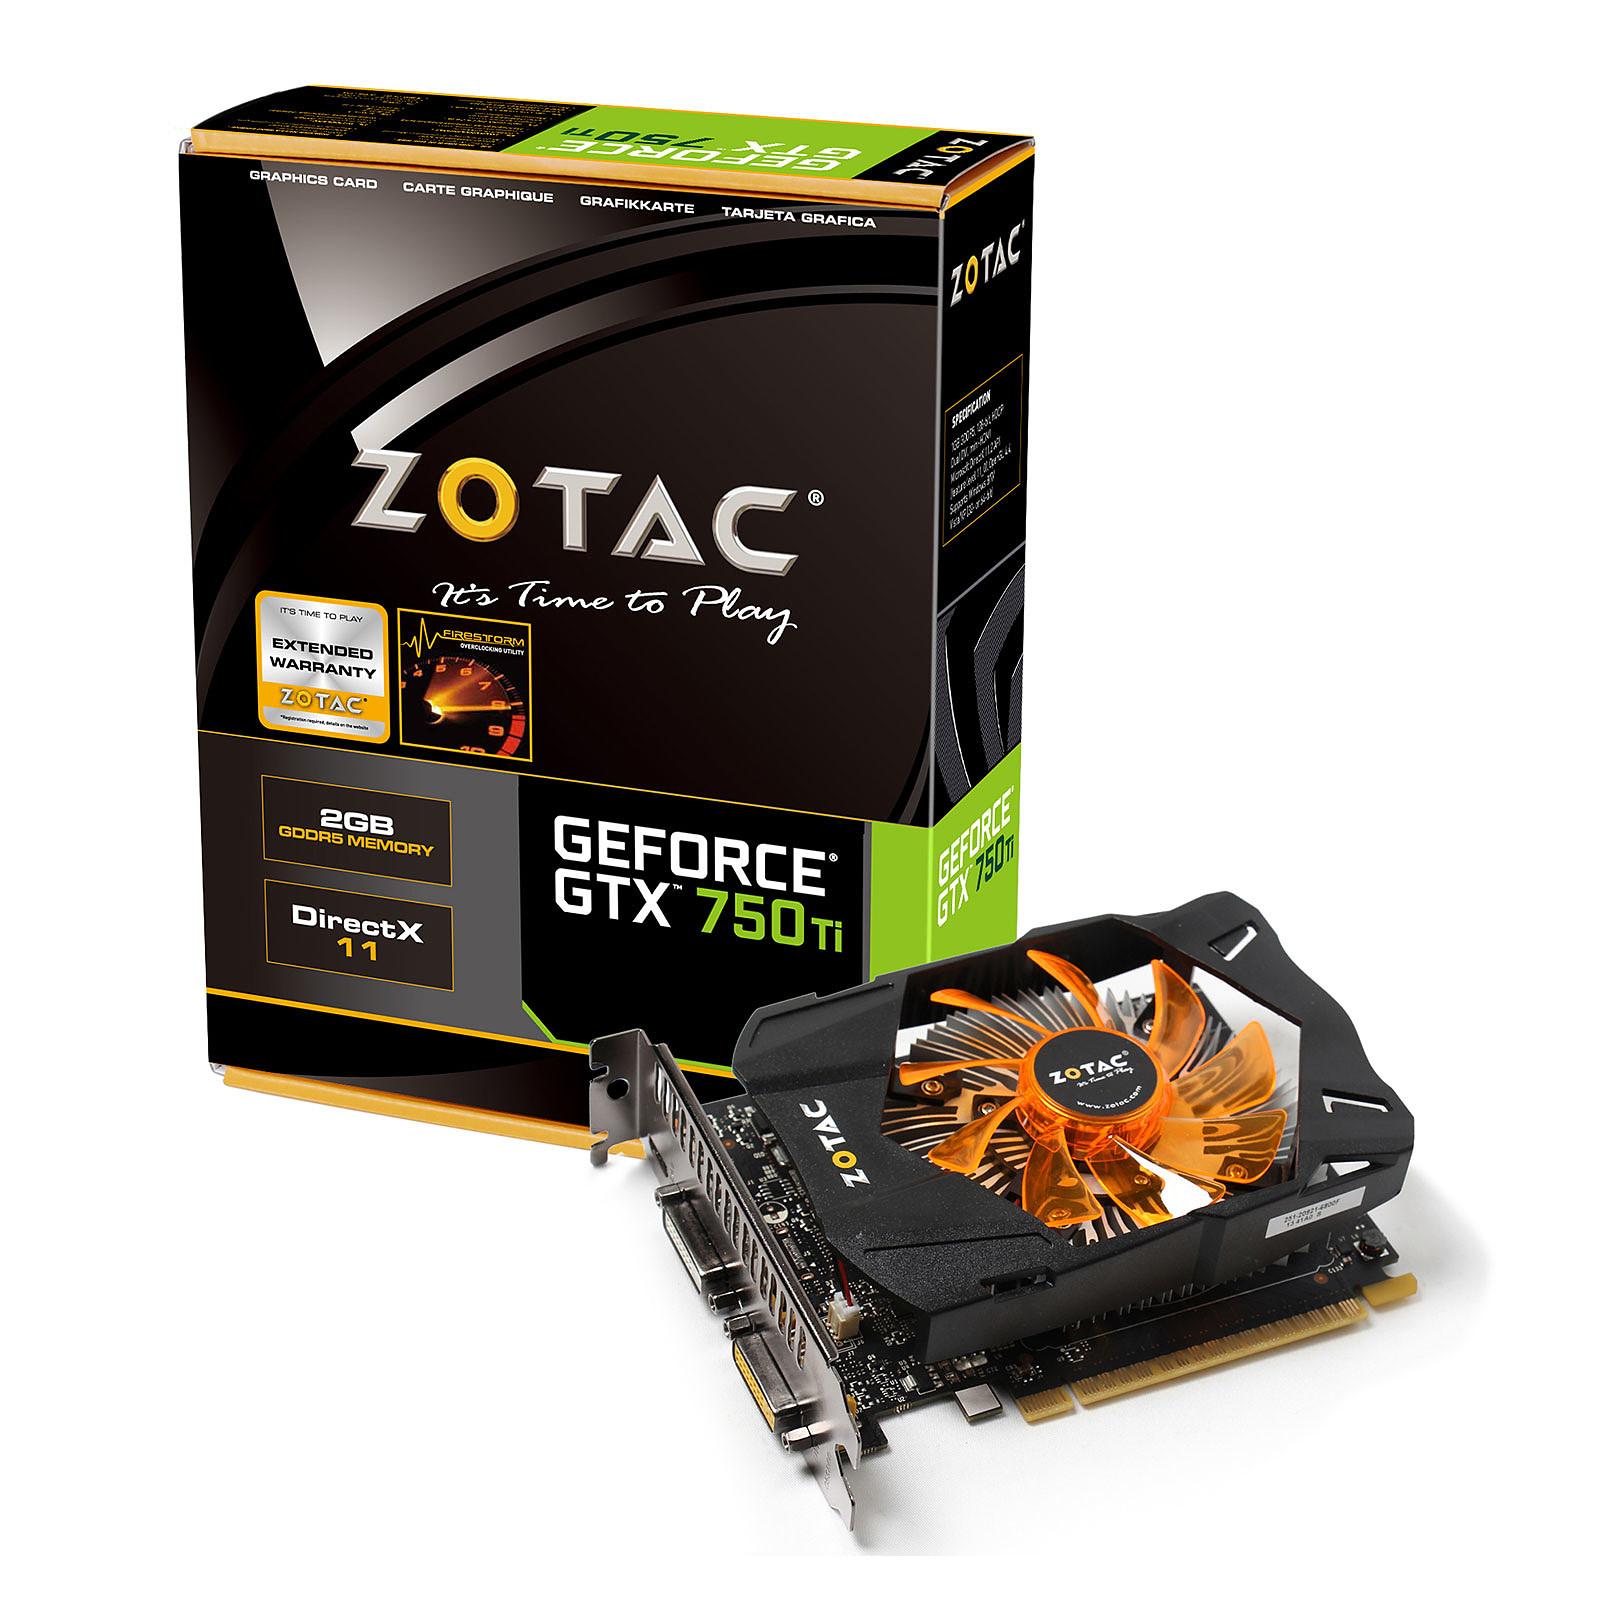 Zotac GeForce GTX 750 Ti 2GB